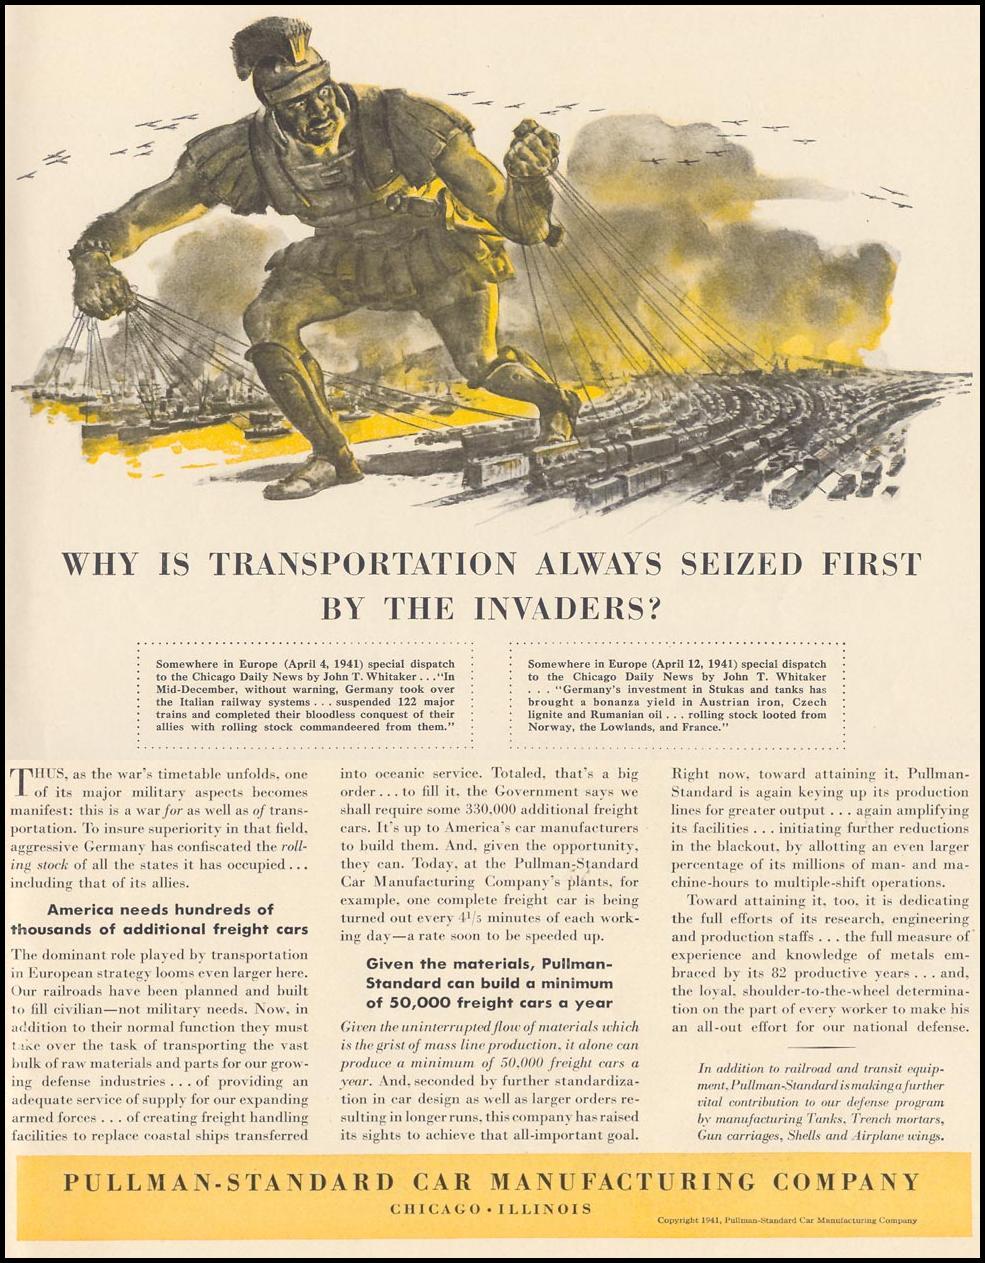 PULLMAN WAR PRODUCTION LIFE 10/13/1941 p. 137